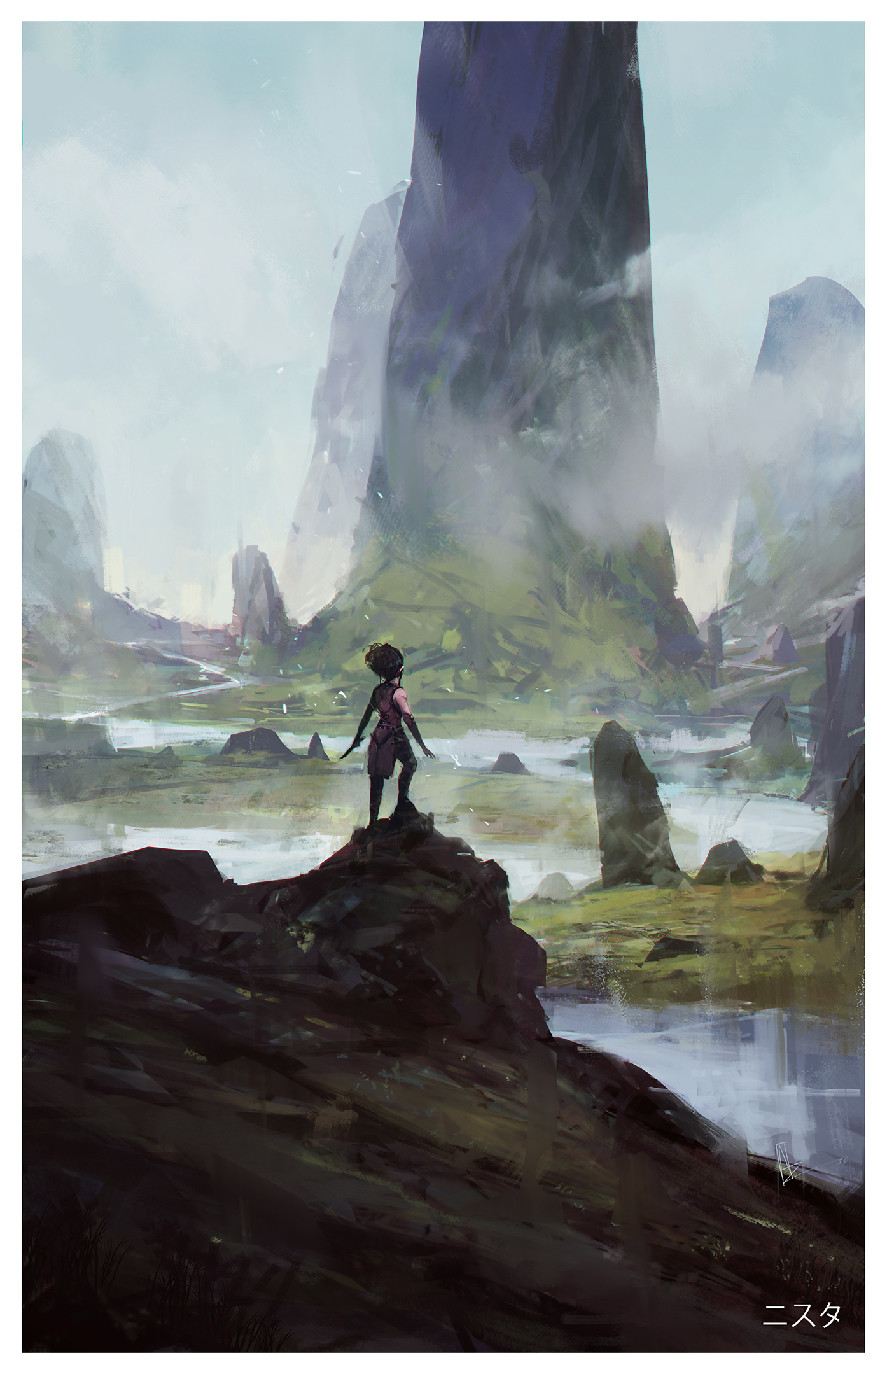 NYSTA : The Sea of Revenants